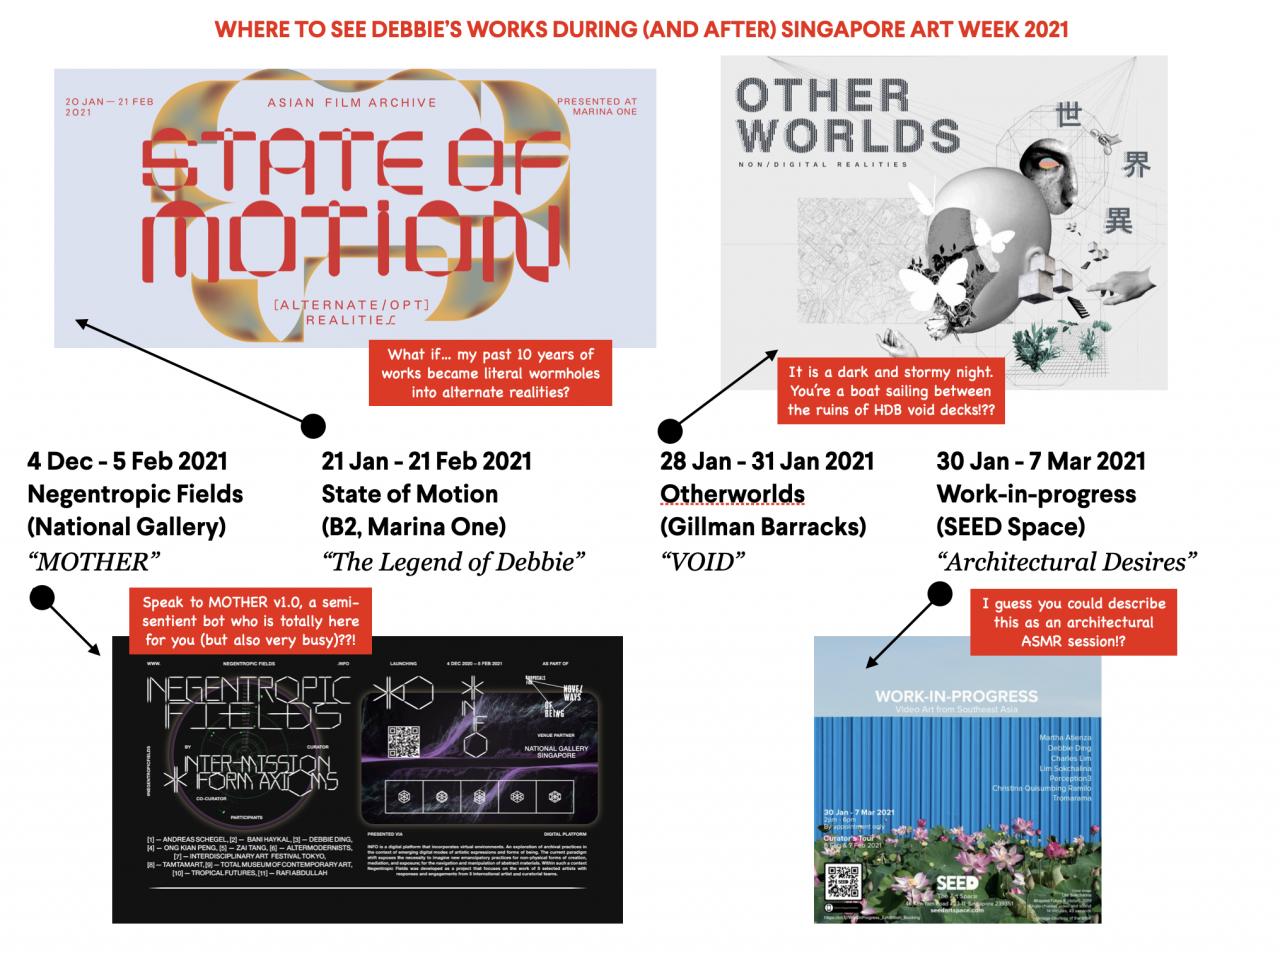 Singapore Art Week 2021: Where to see Debbie's Works